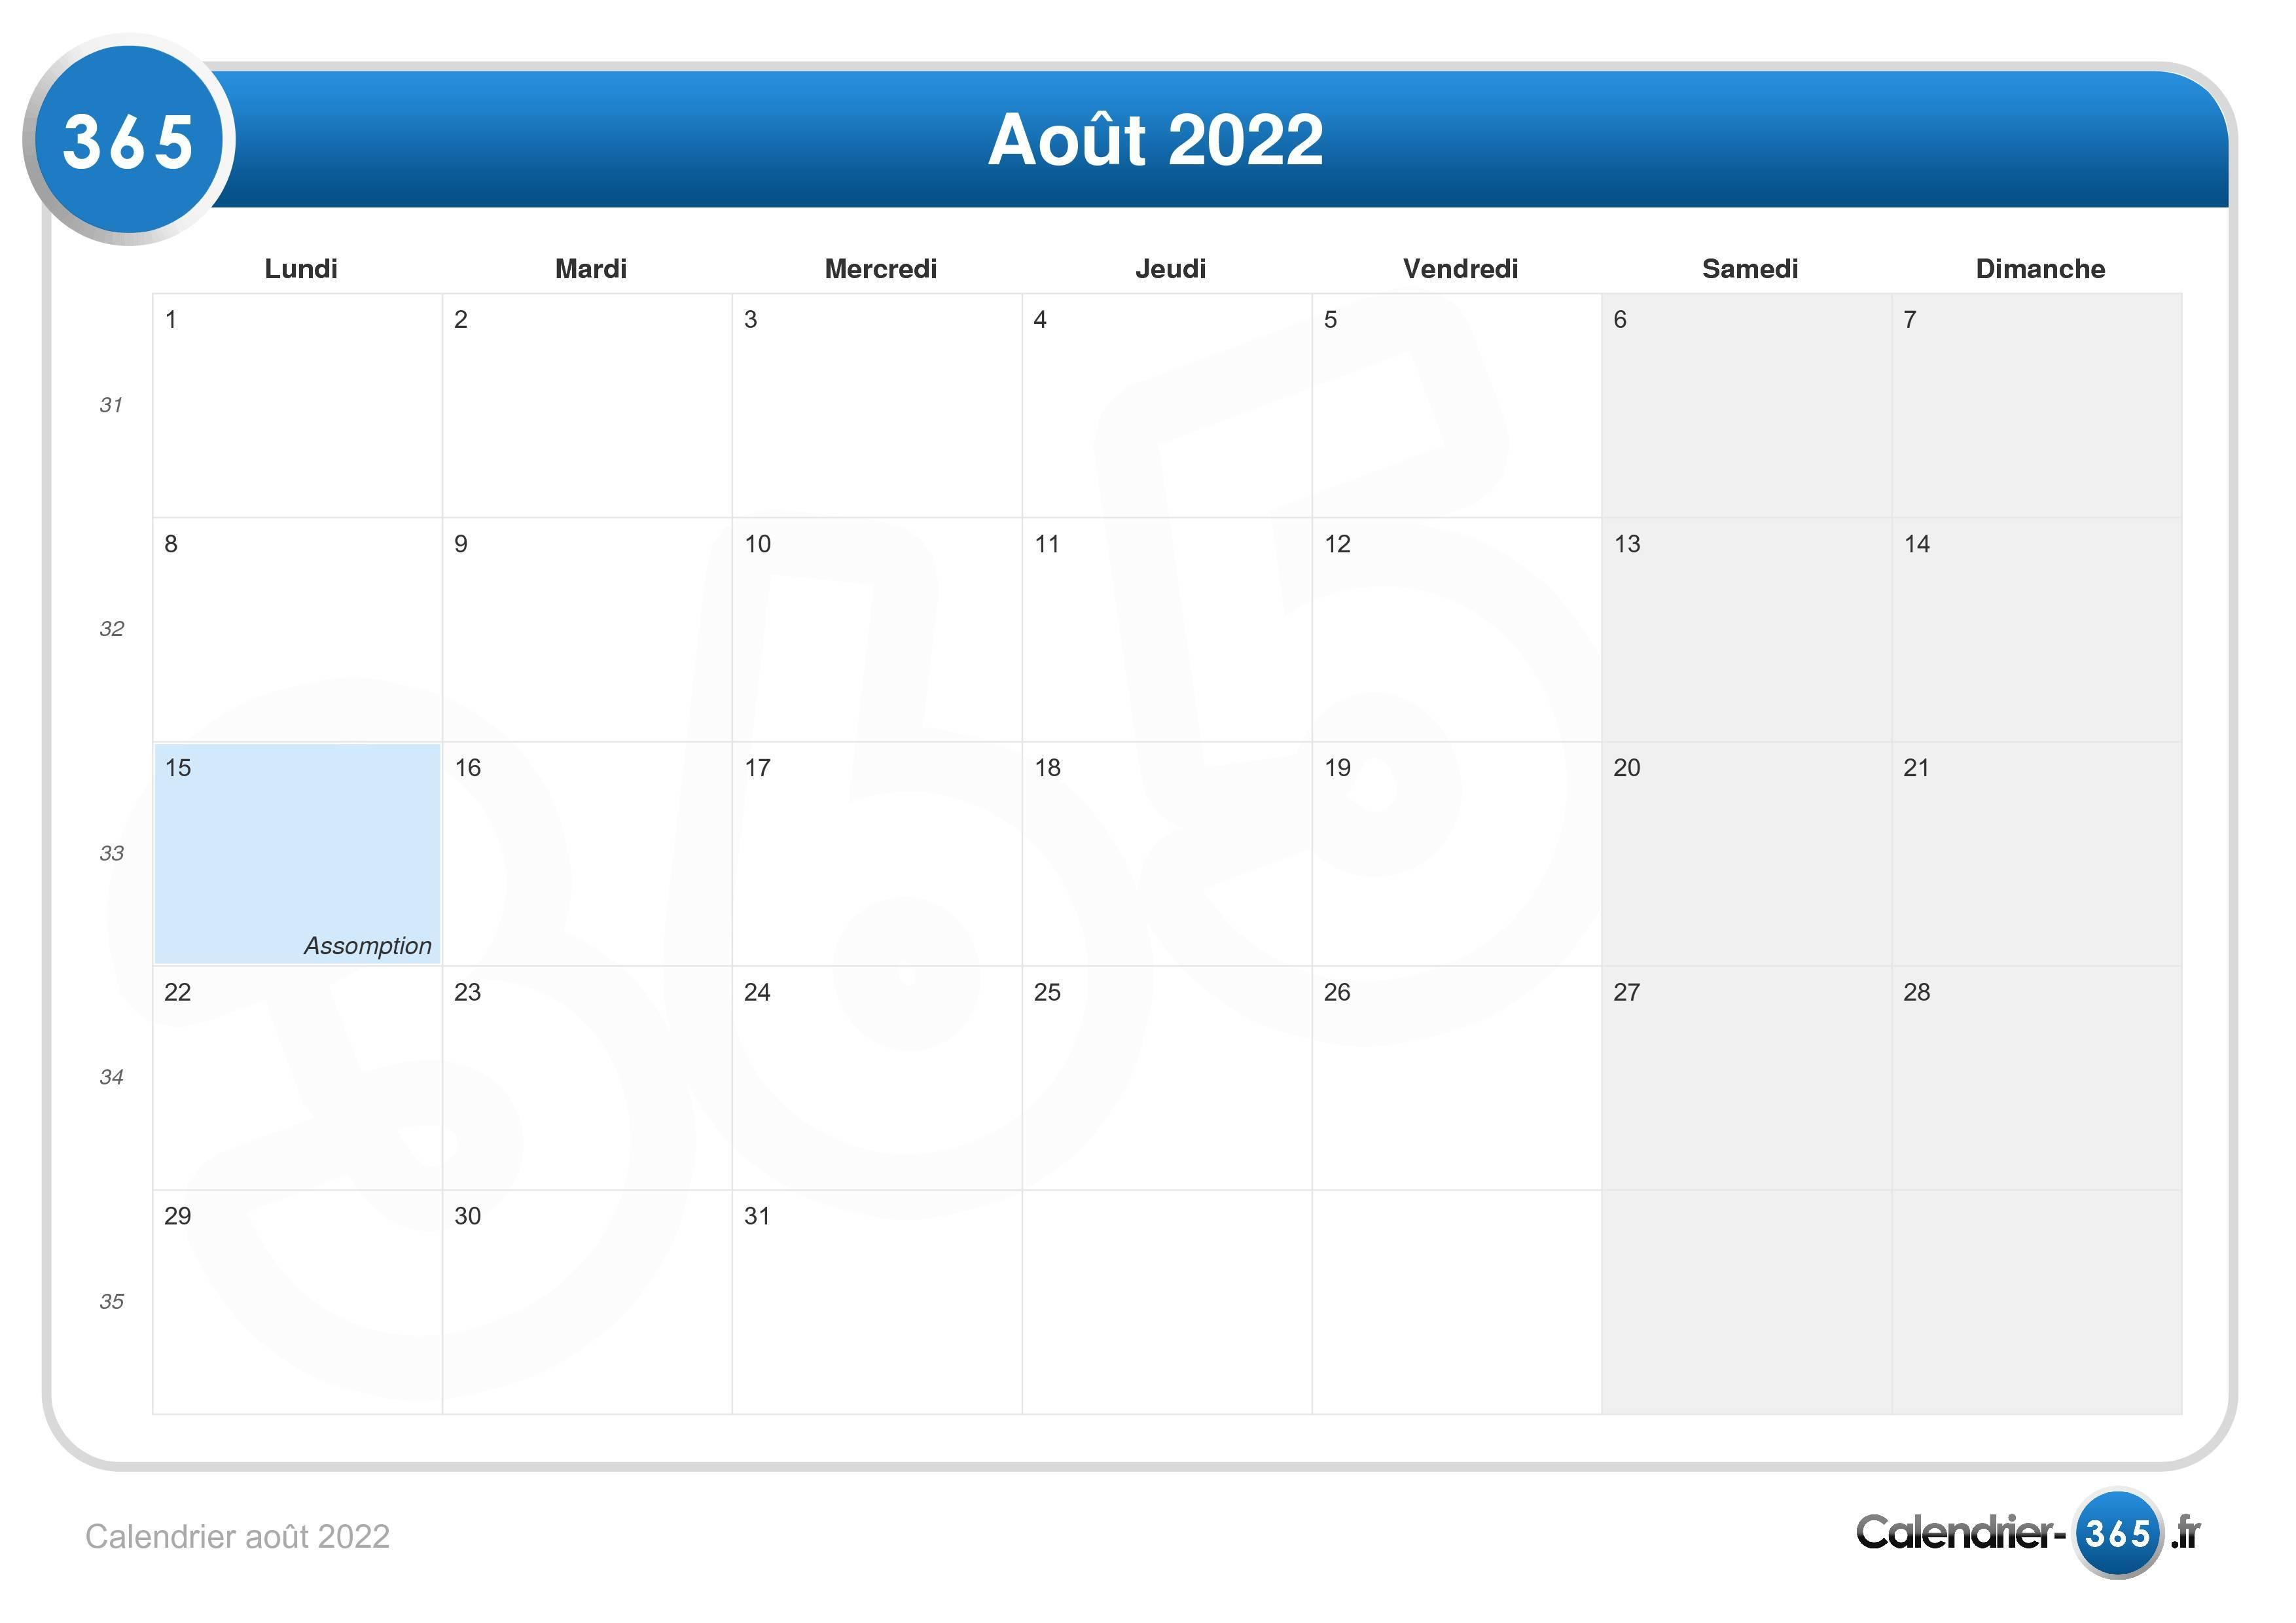 Aout 2022 Calendrier Calendrier août 2022